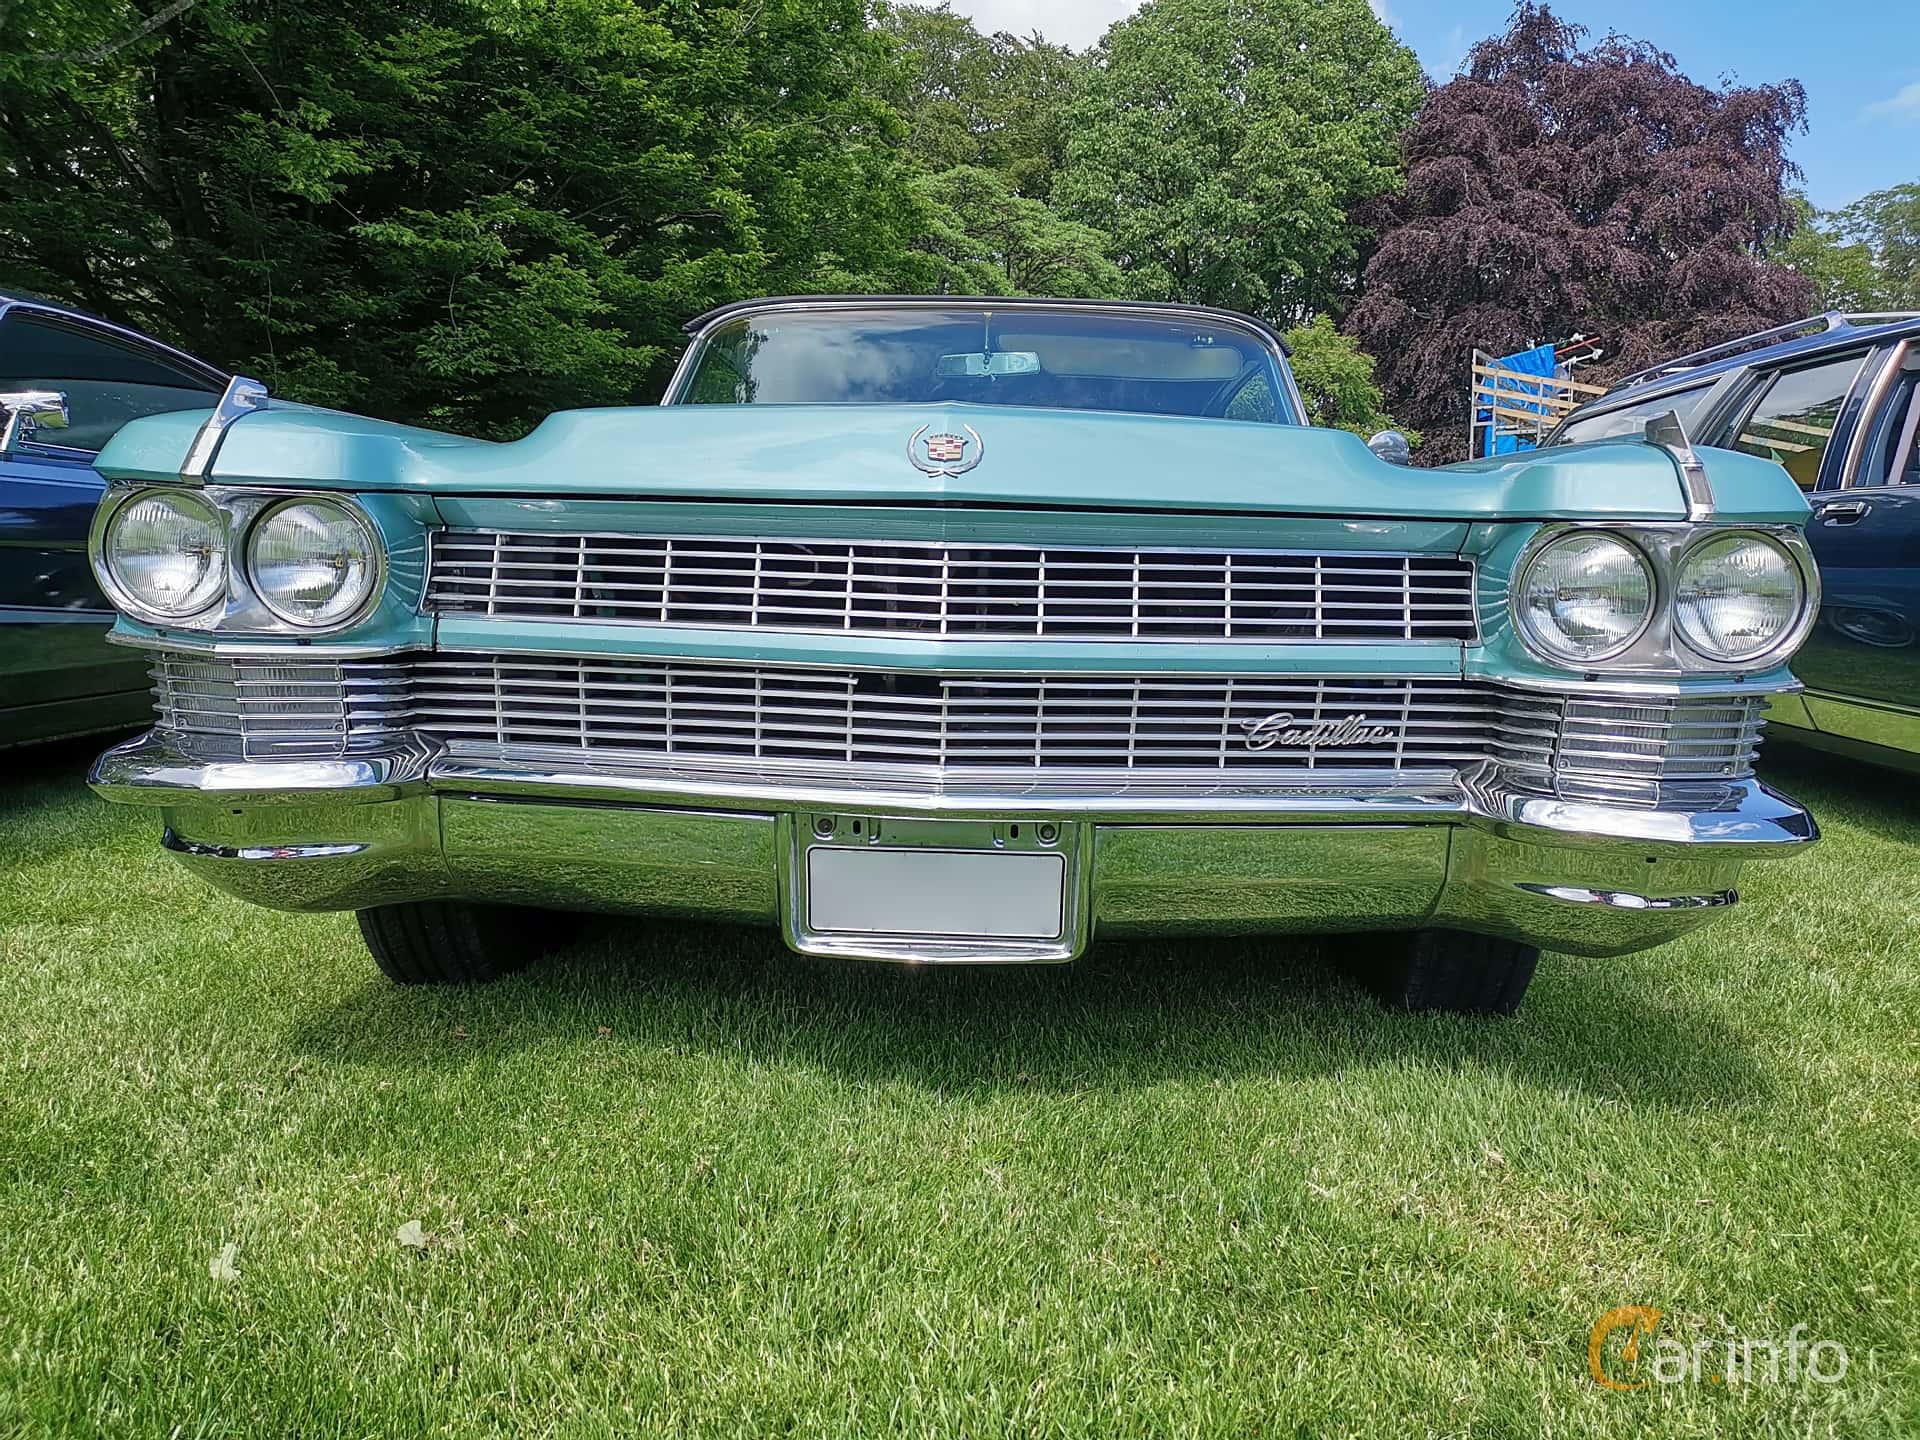 Cadillac Fleetwood Eldorado Convertible 7.0 V8 OHV Hydra-Matic, 345hp, 1964 at Sofiero Classic 2019